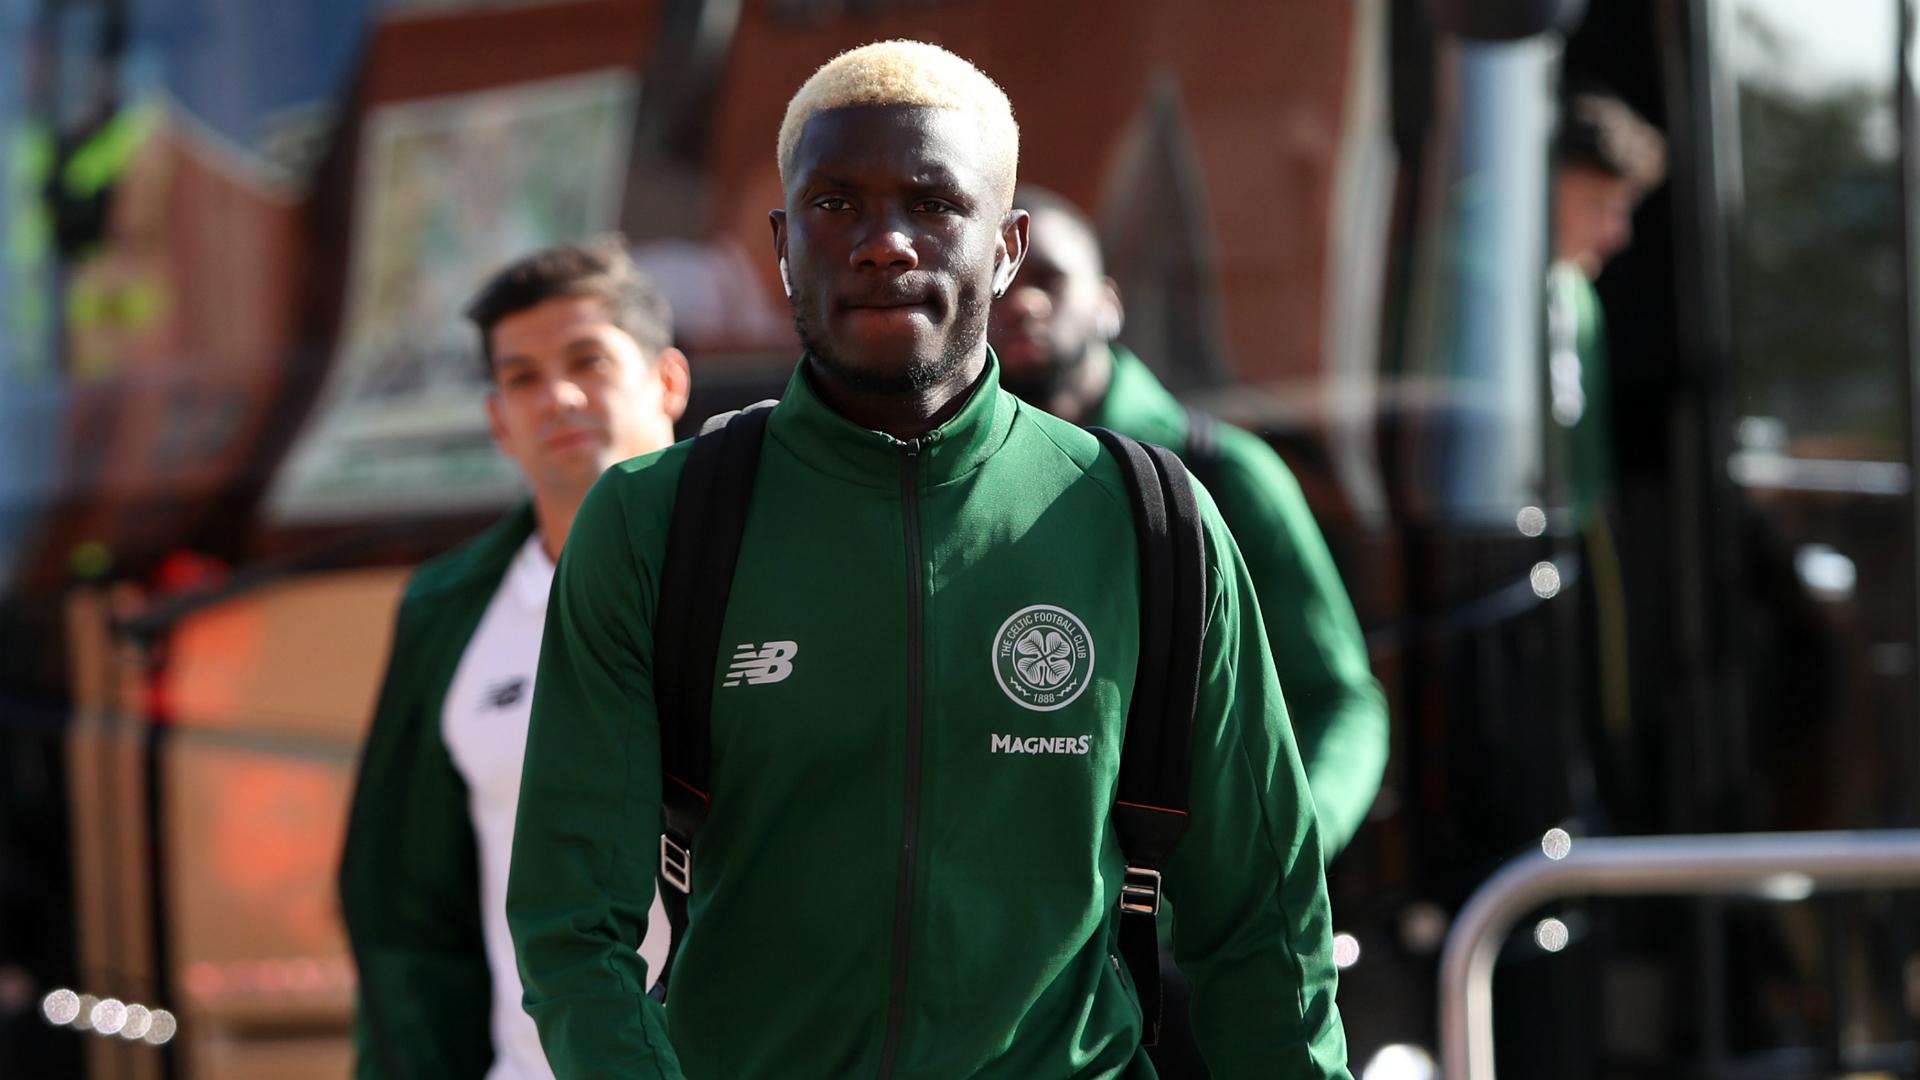 'Genk loan was not a failure' – Celtic's Kouassi insists after Belgian league ends